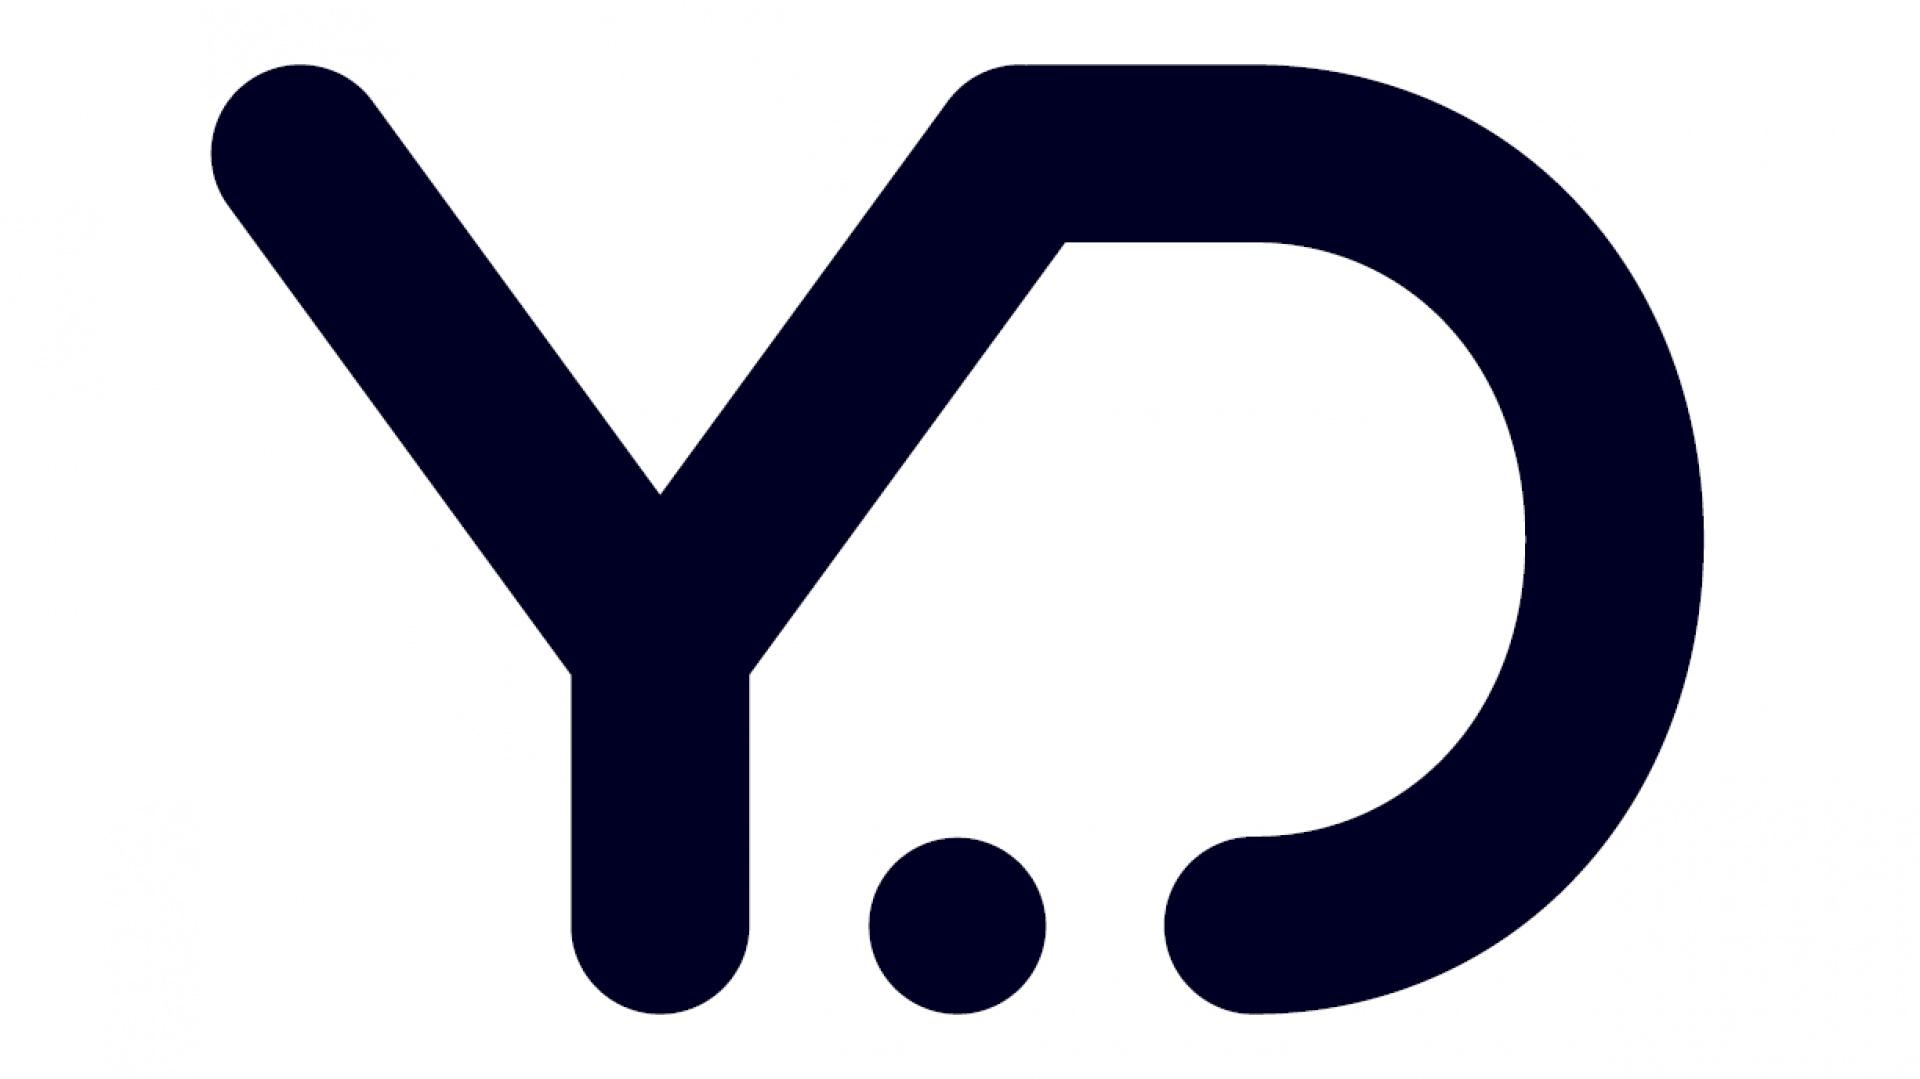 Logo konkursu Young Design. Fot. Plakat prasowy